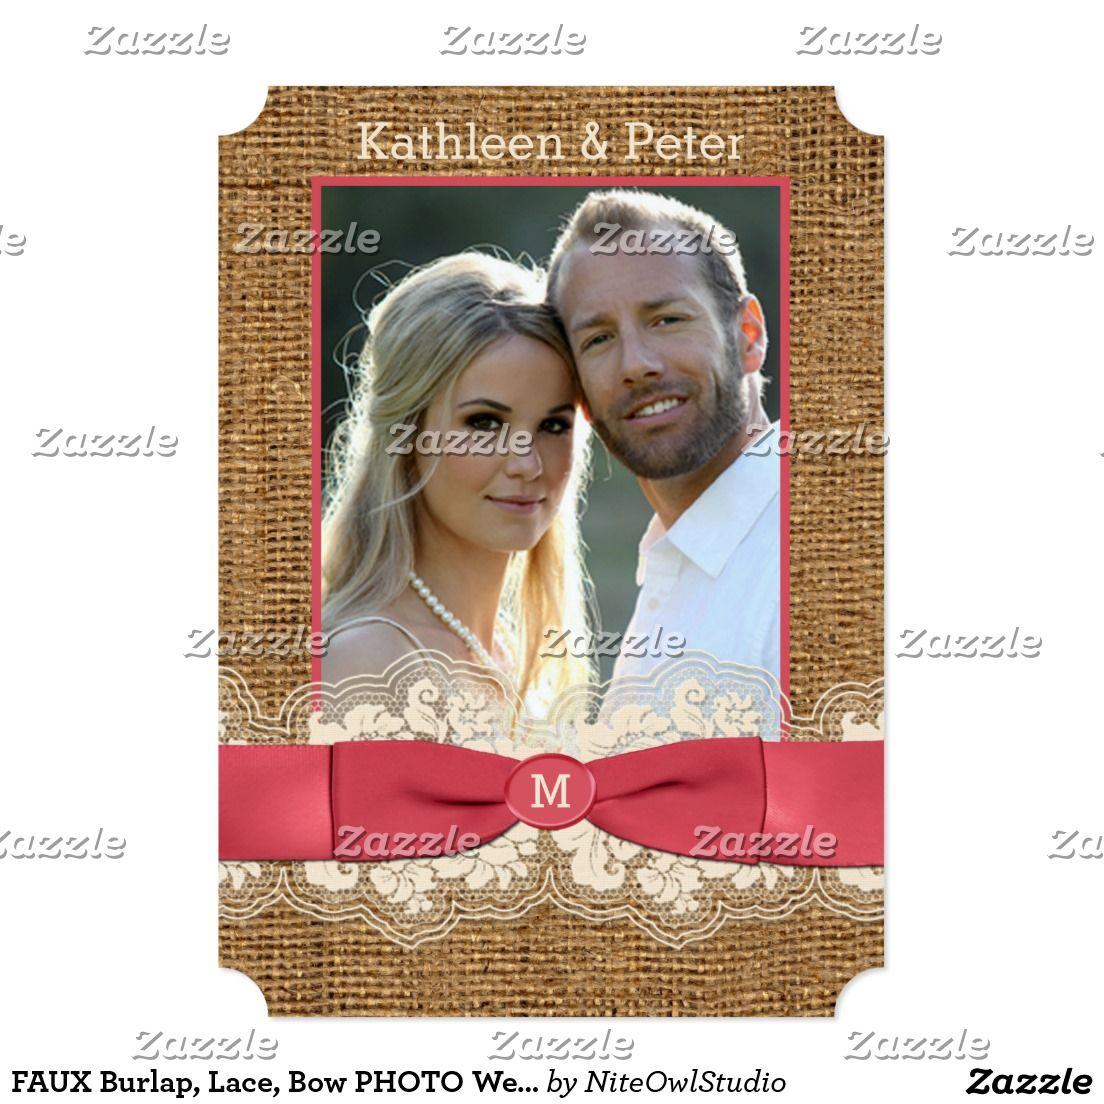 FAUX Burlap, Lace, Bow PHOTO Wedding Invite - Pink